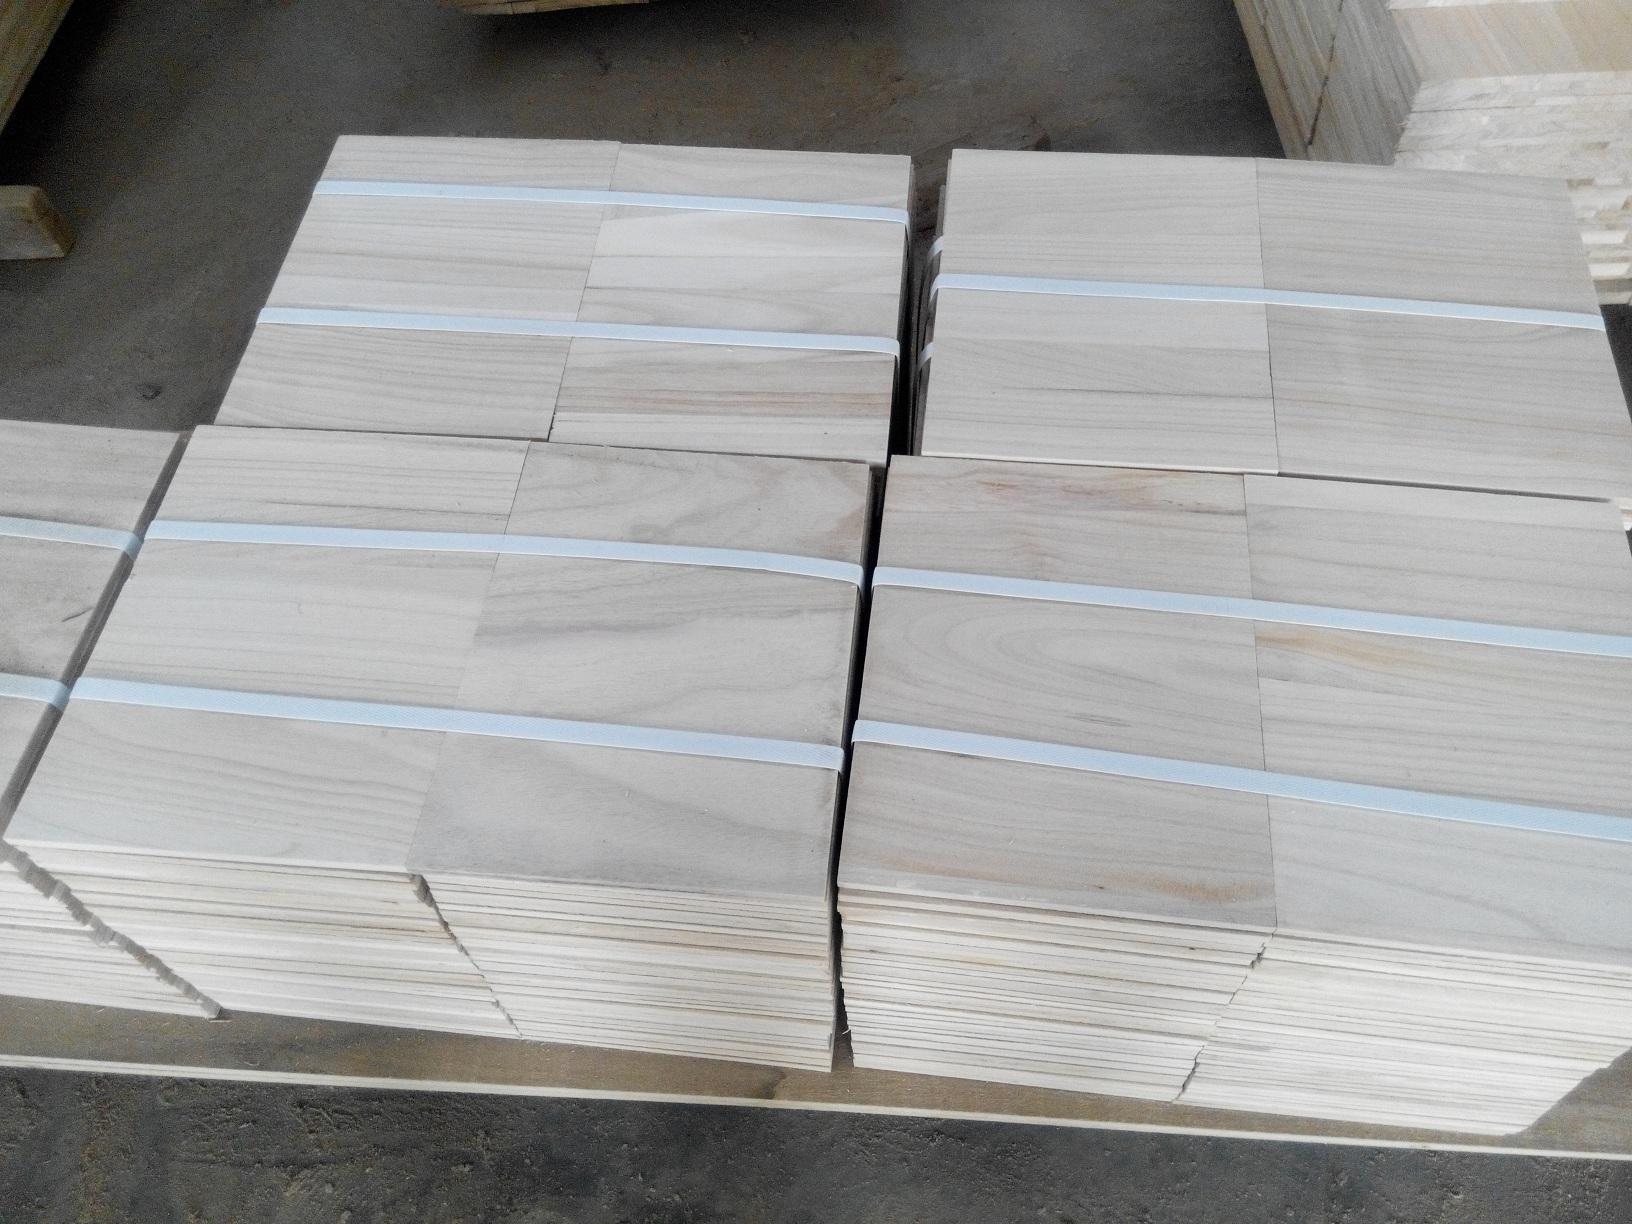 pine wood break board for taekwondo